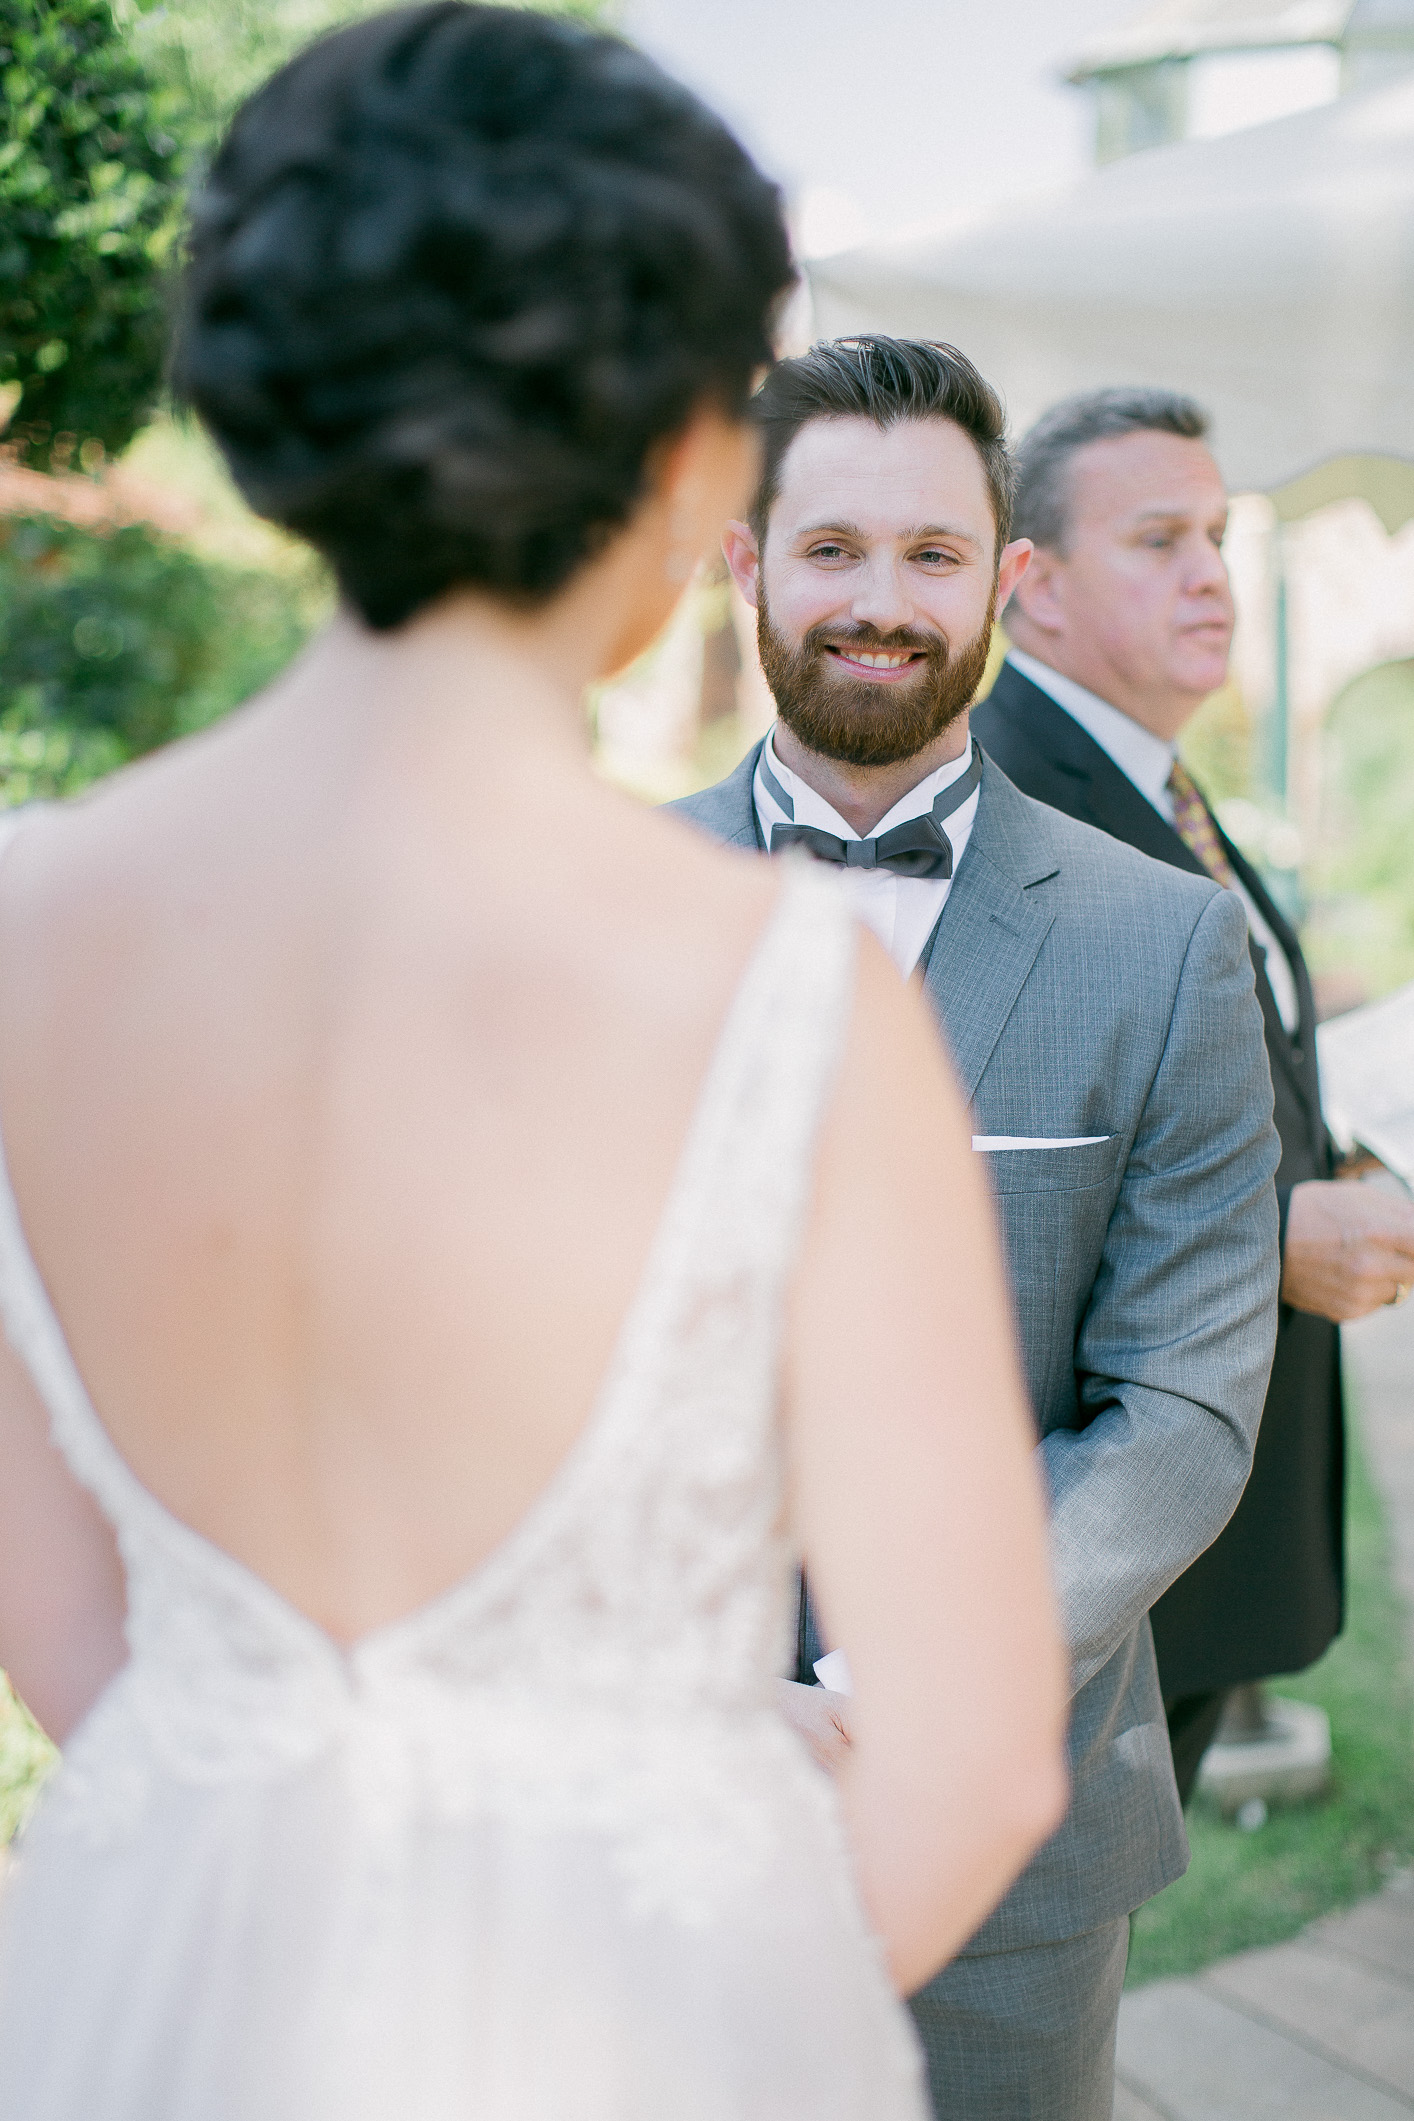 shepstone gardens wedding photographer 2017036.jpg